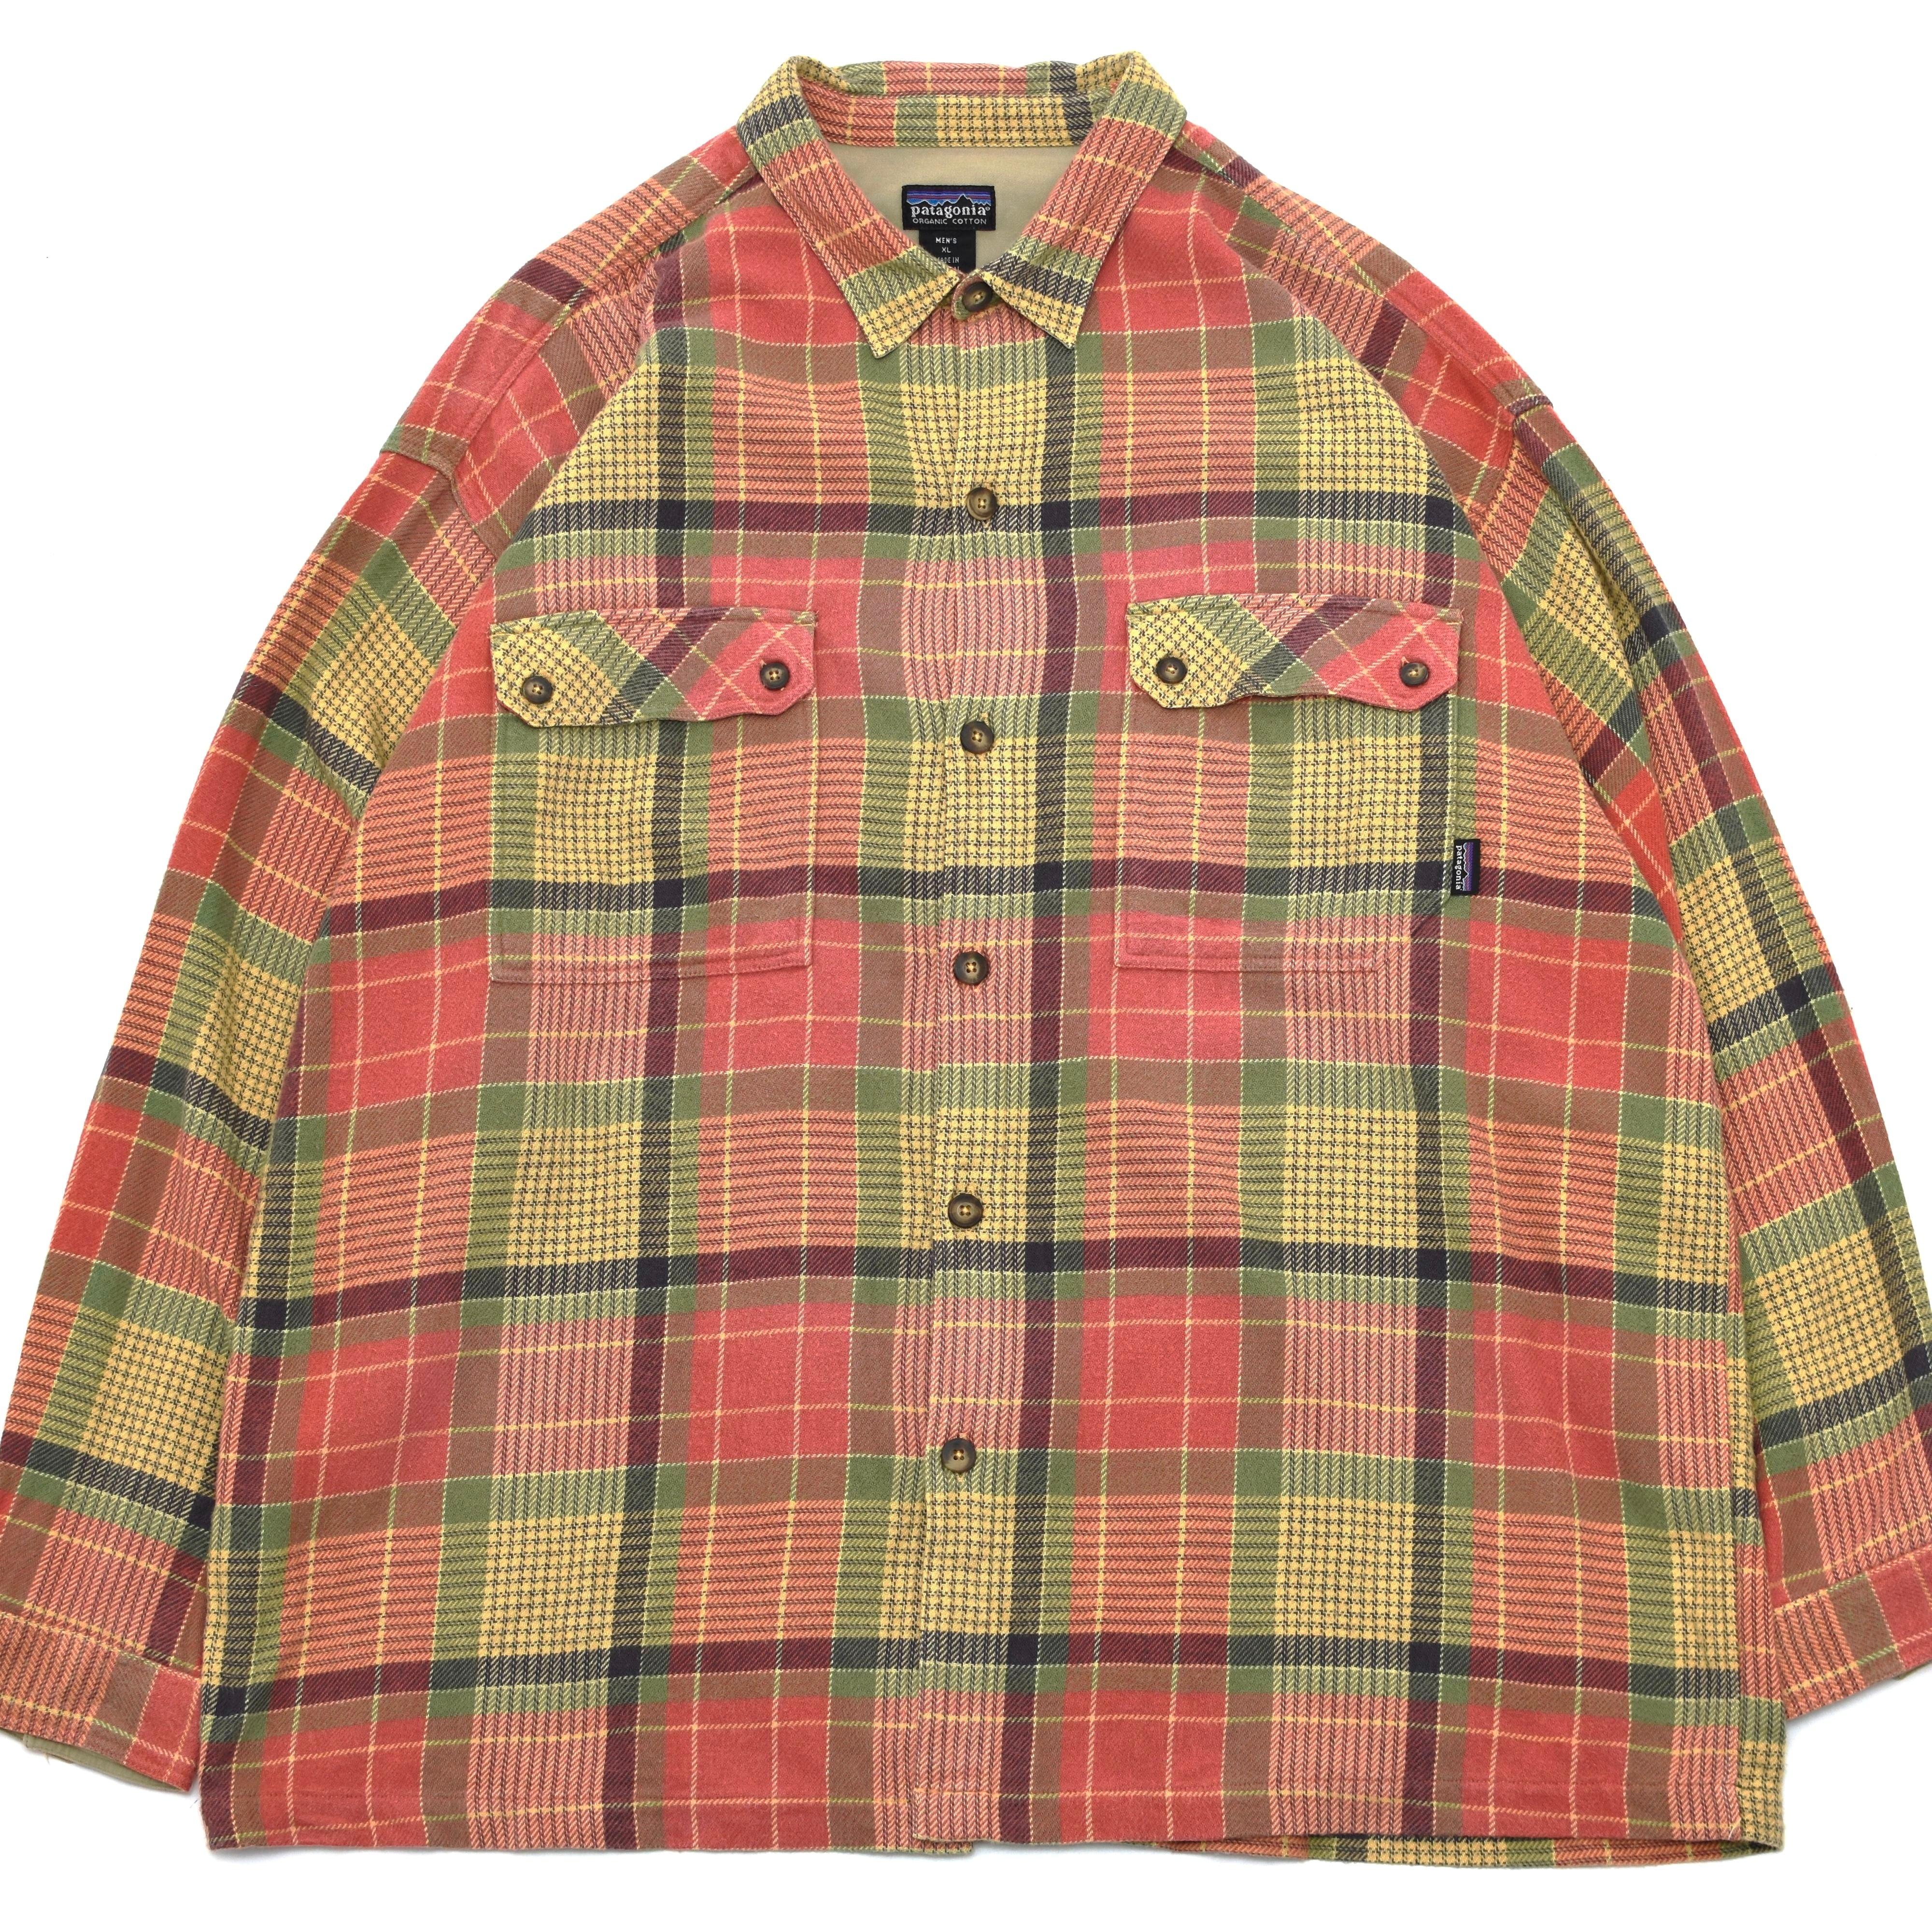 00's patagonia check heavy flannel shirt